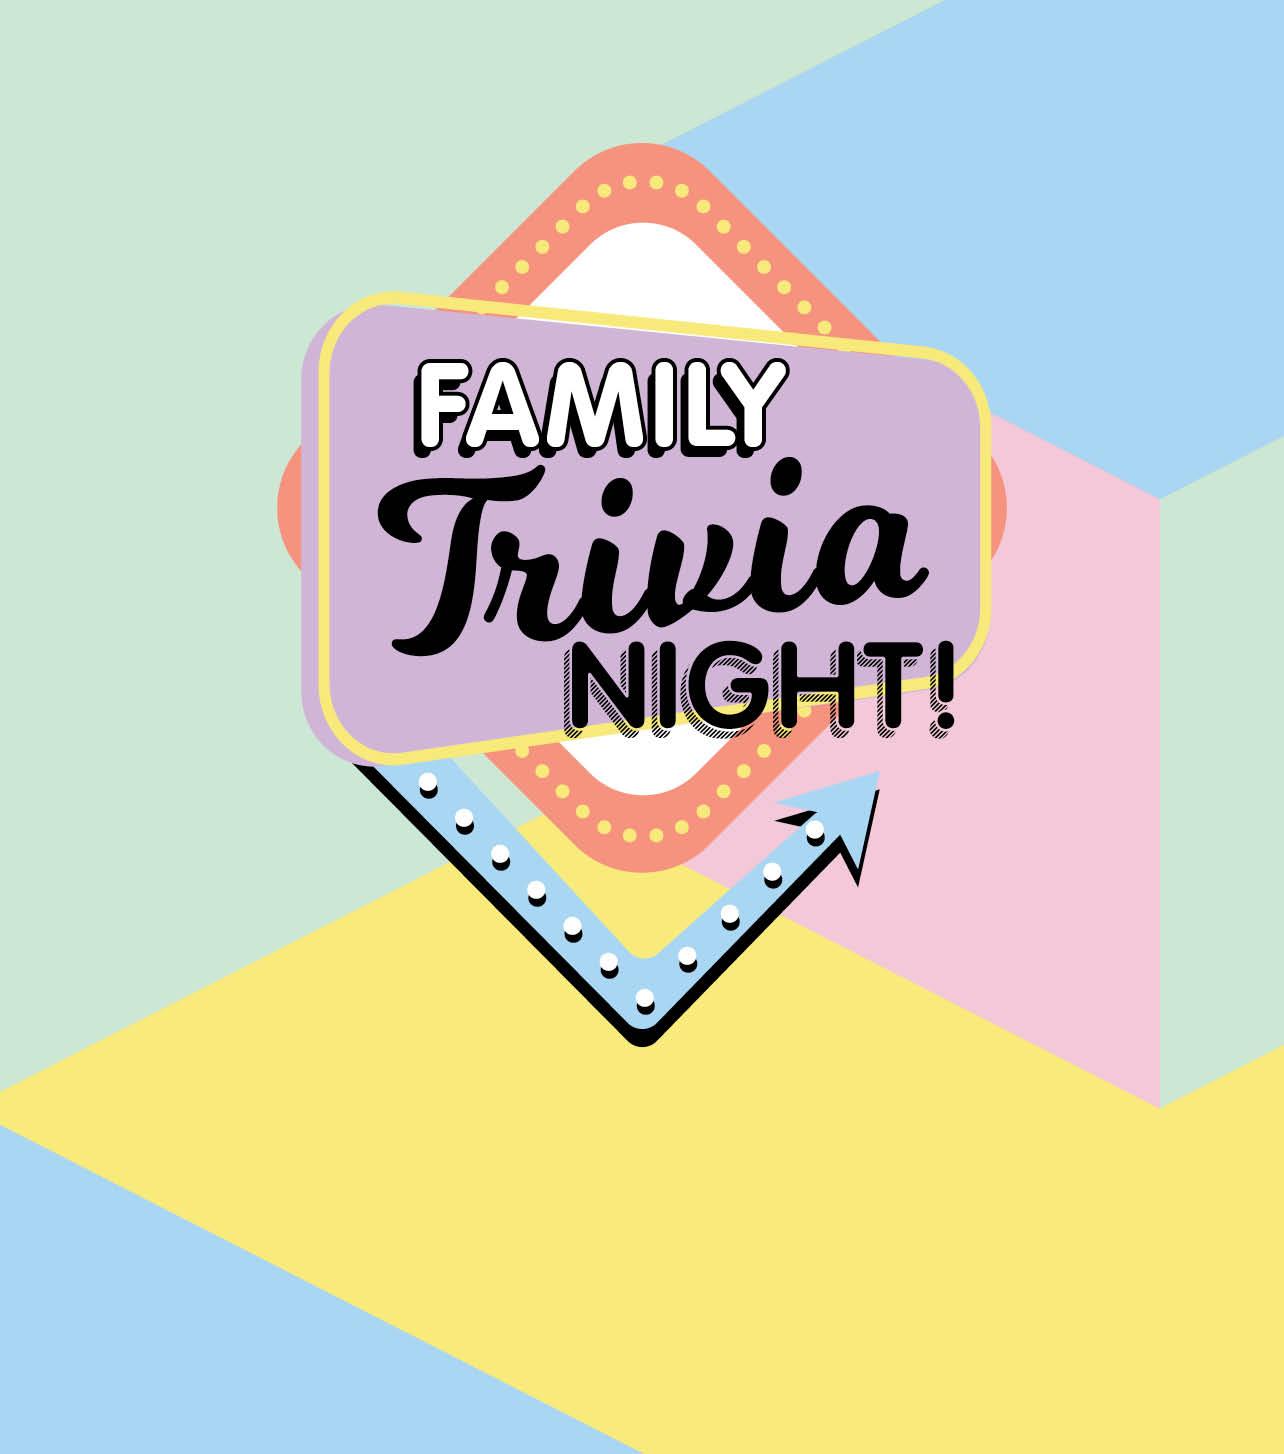 CH5661_Charter Hall_Family Trivia Night_Web Tiles_642x727